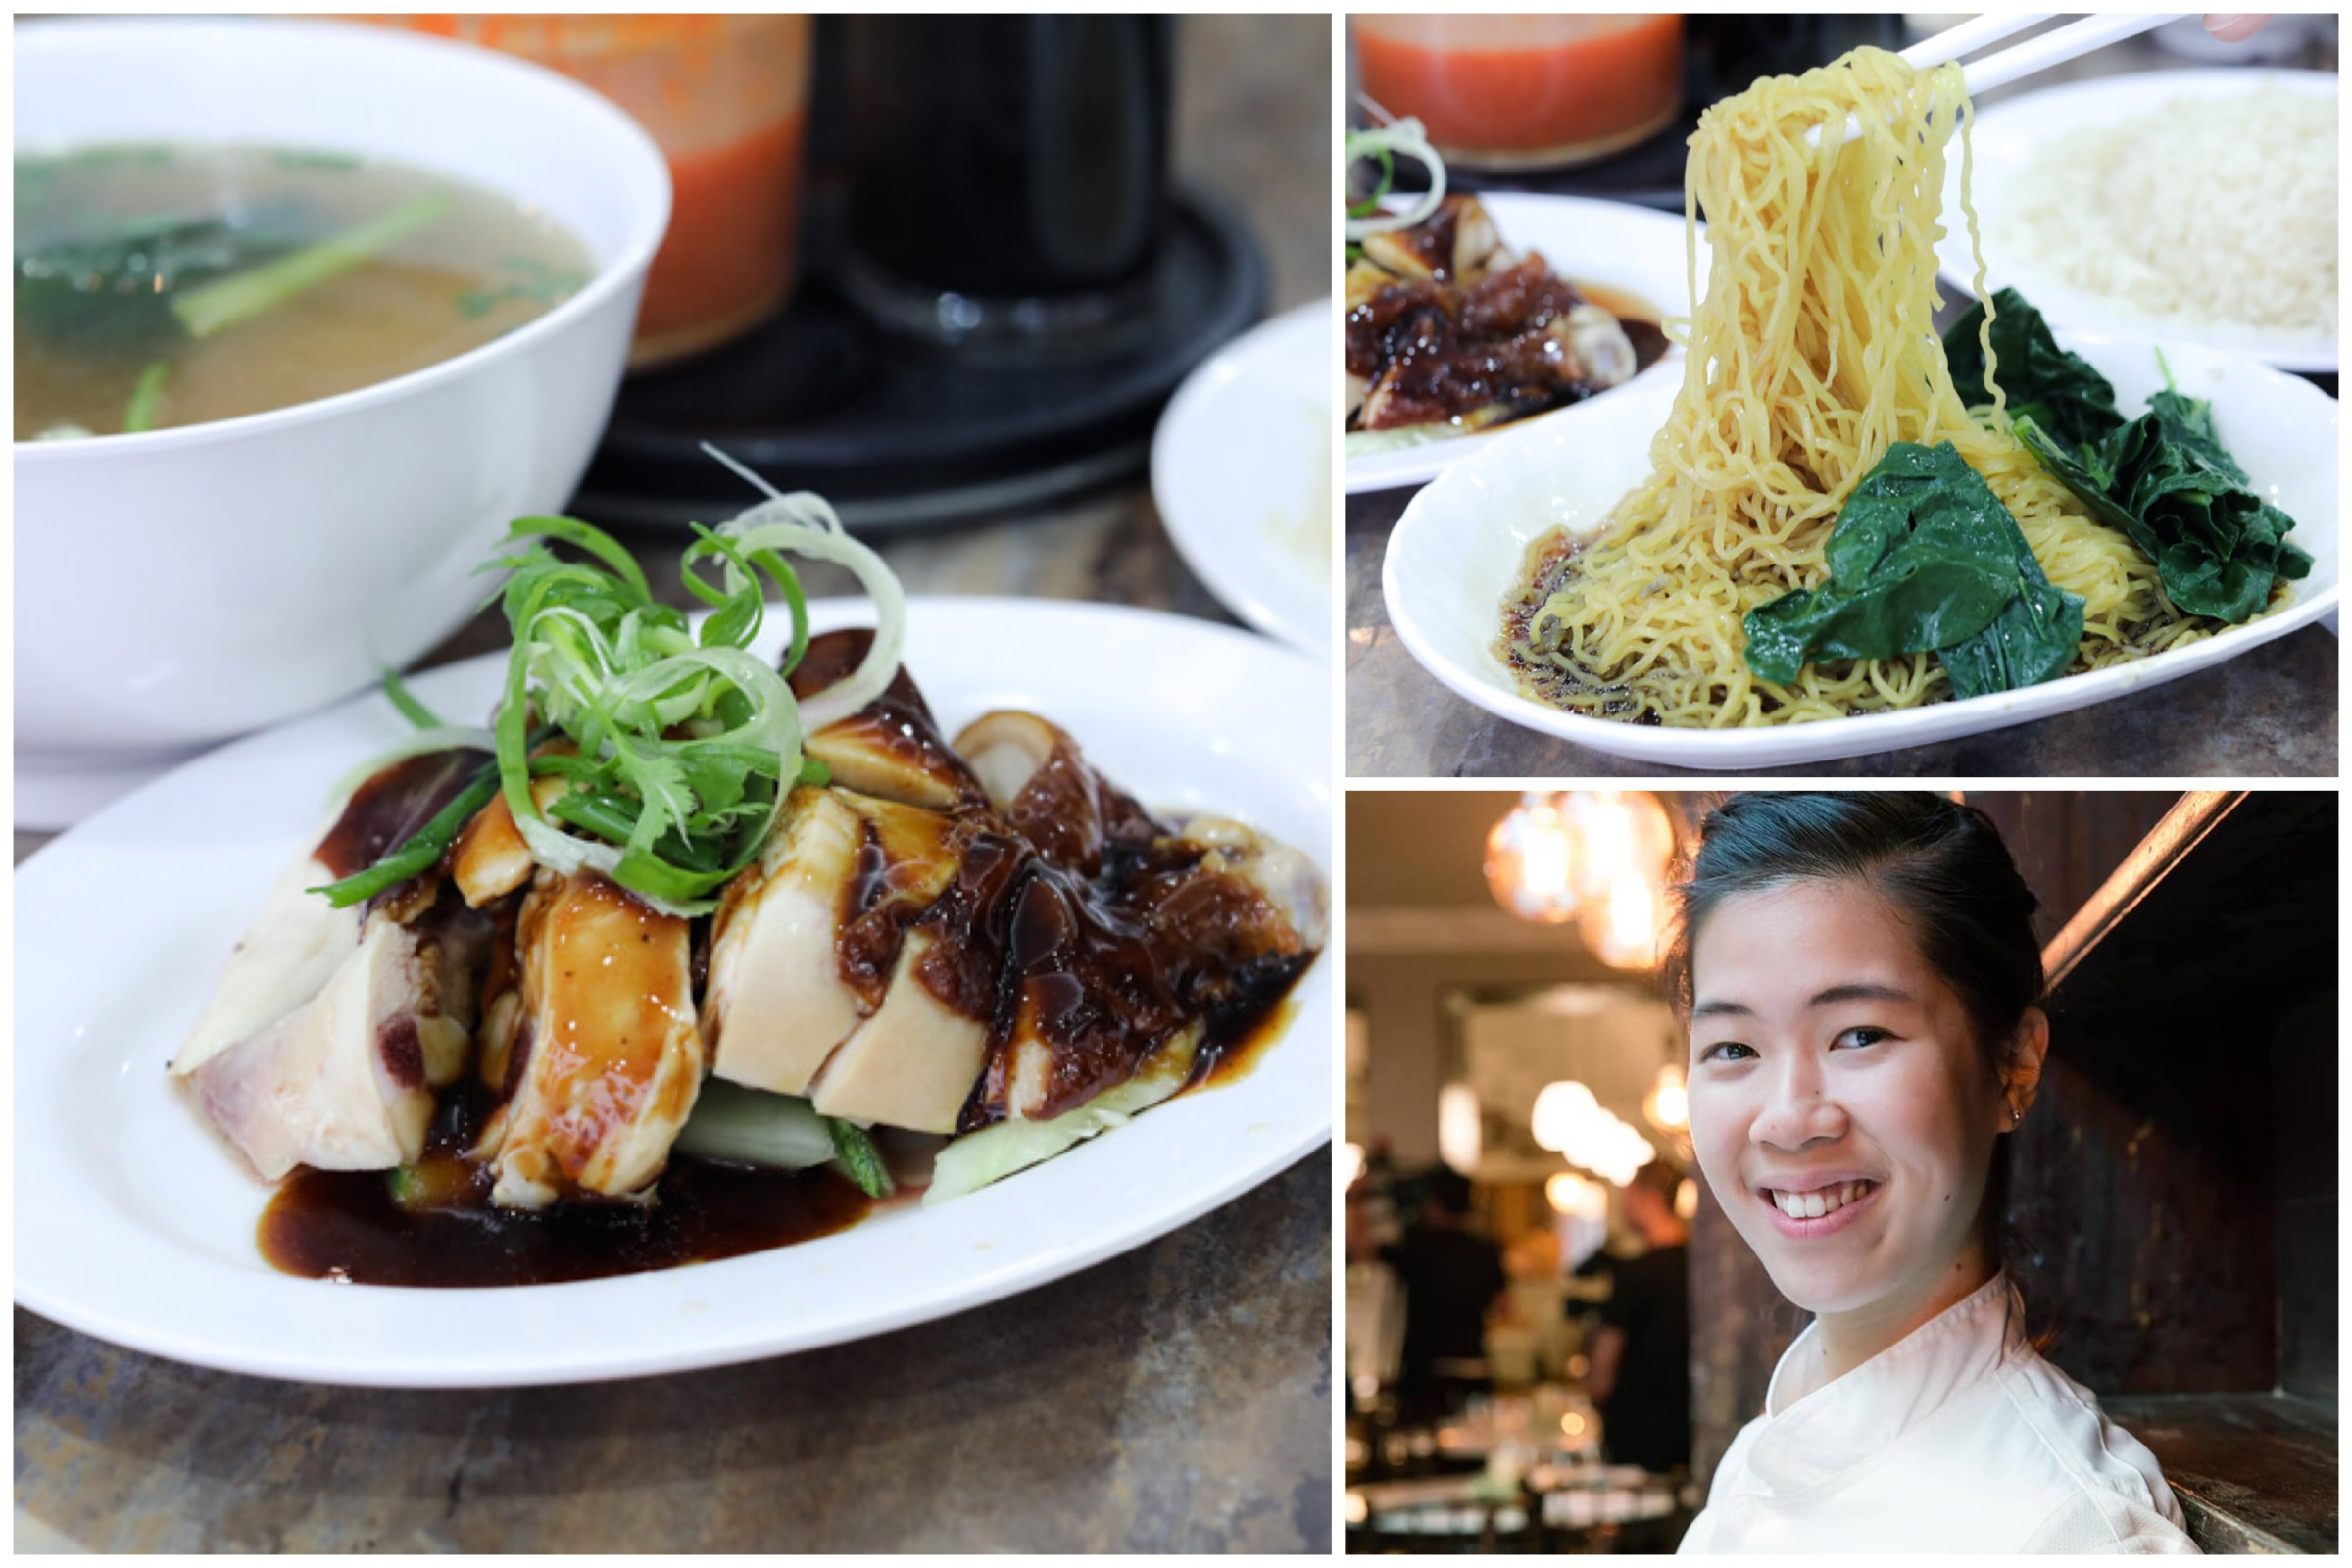 Lee Fun Nam Kee – Soya Sauce Chicken Rice By MasterChef Singapore Finalist Gen's Family